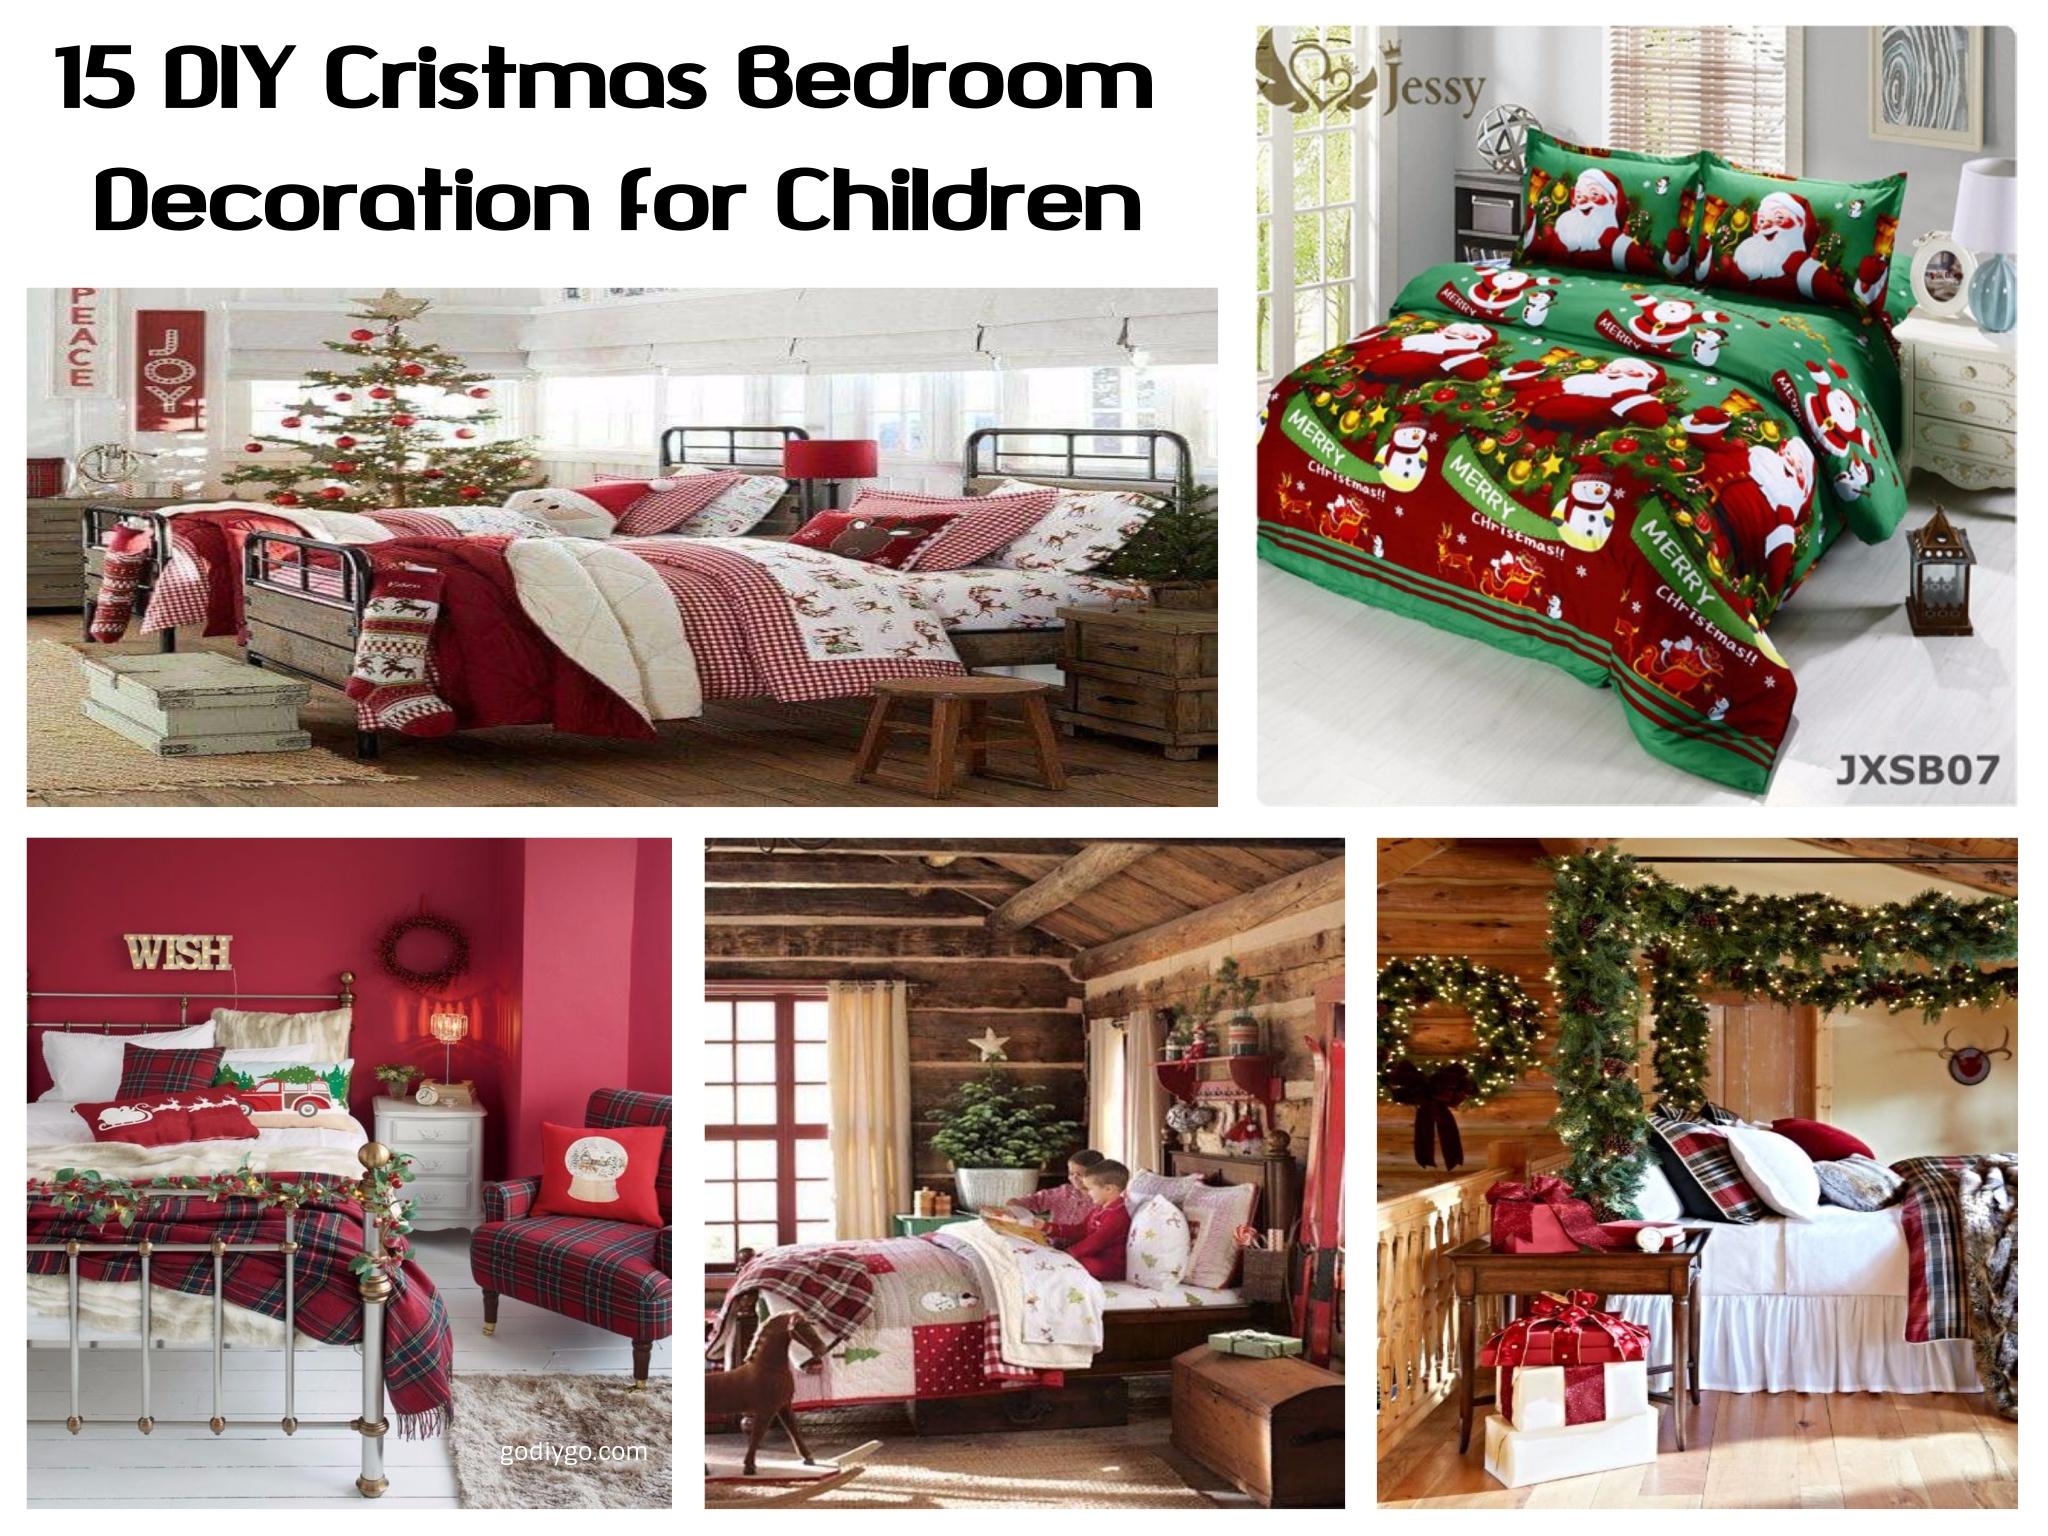 15 DIY Christmas Bedroom Decorations For Children